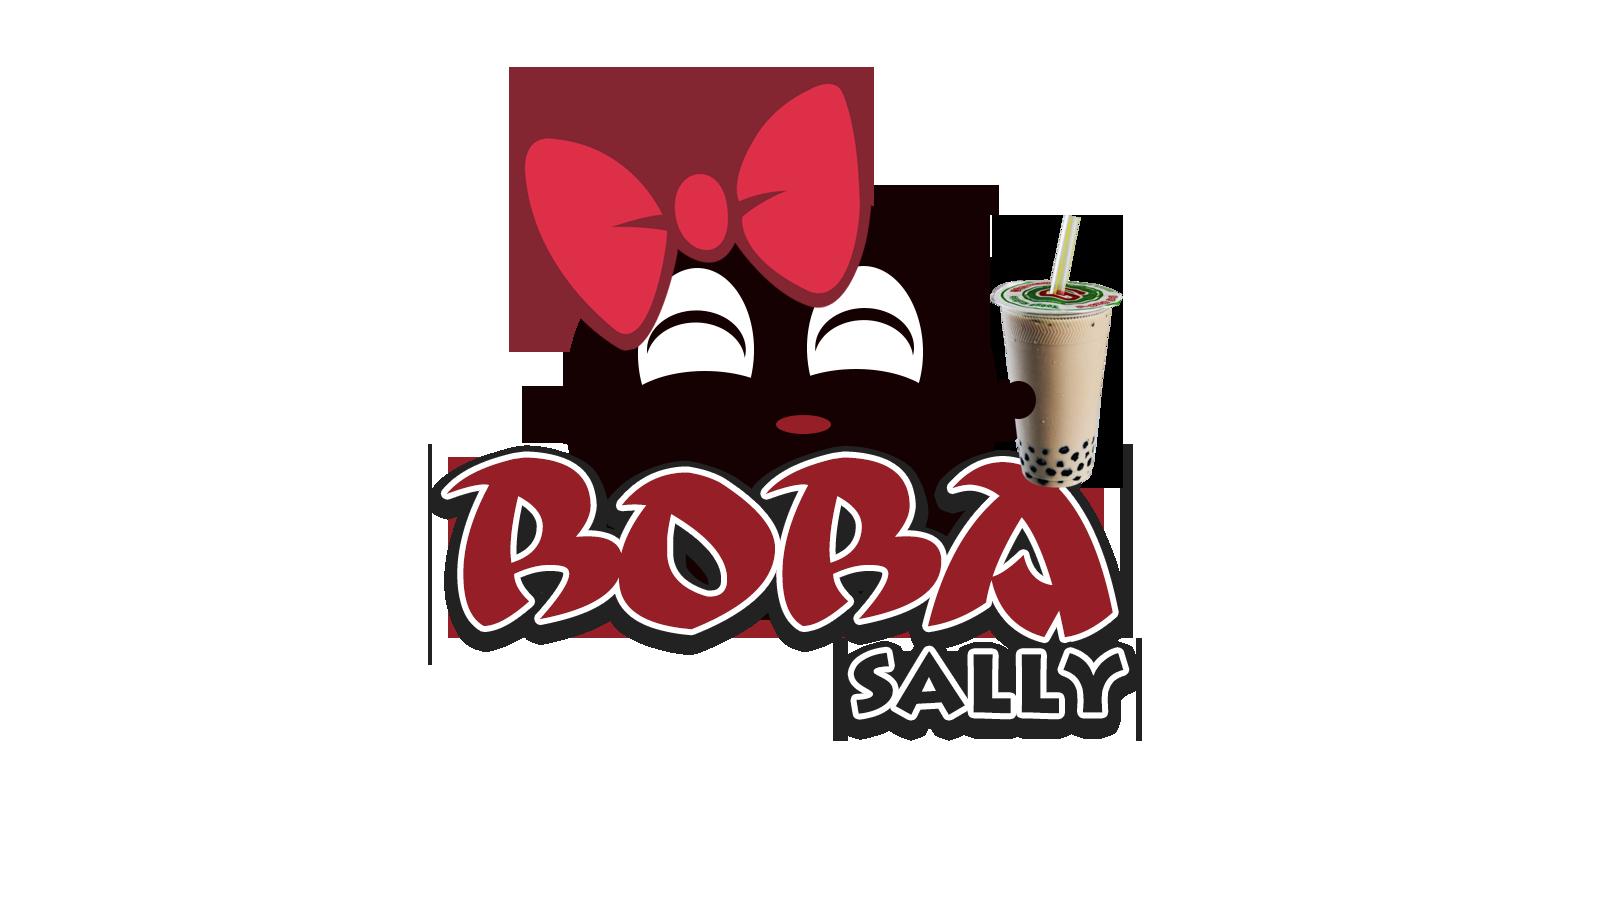 bobasally1